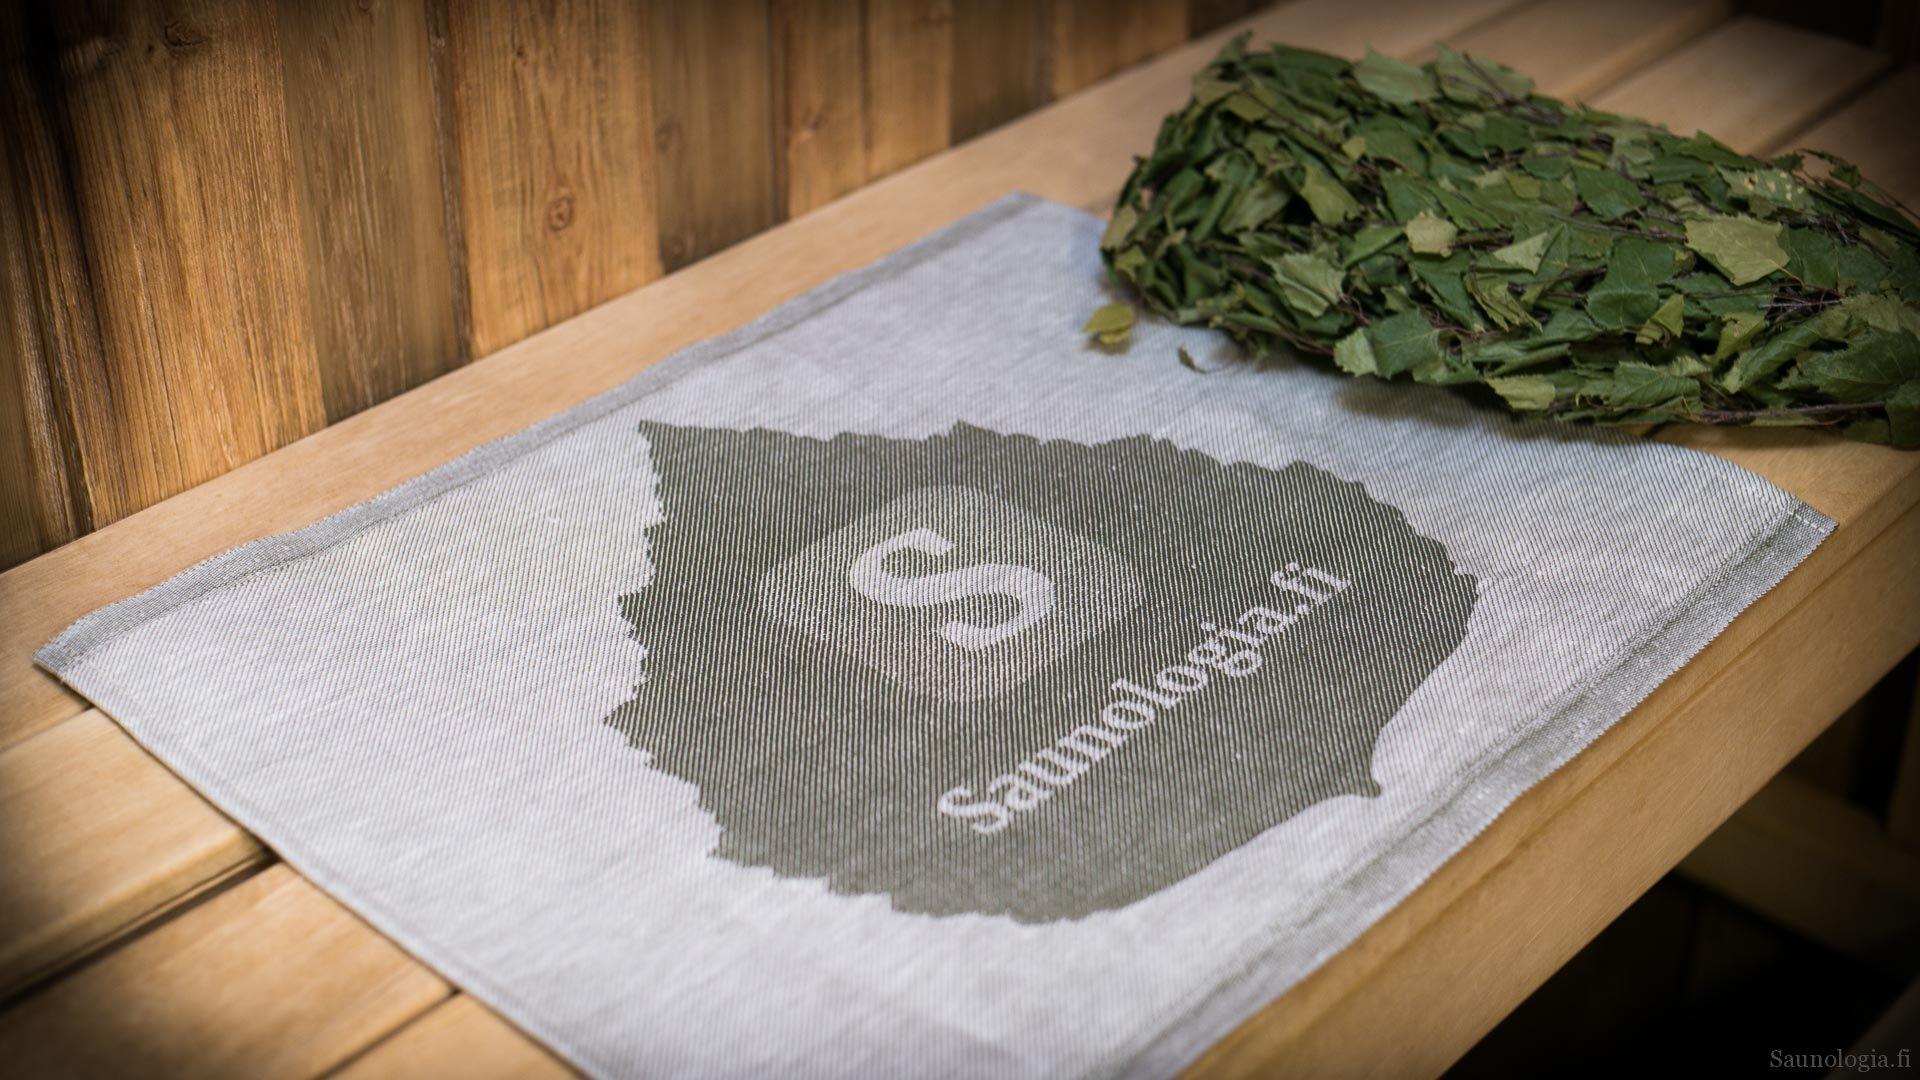 Liity parhaaseen saunajoukkoon – hanki Saunologian laudeliina